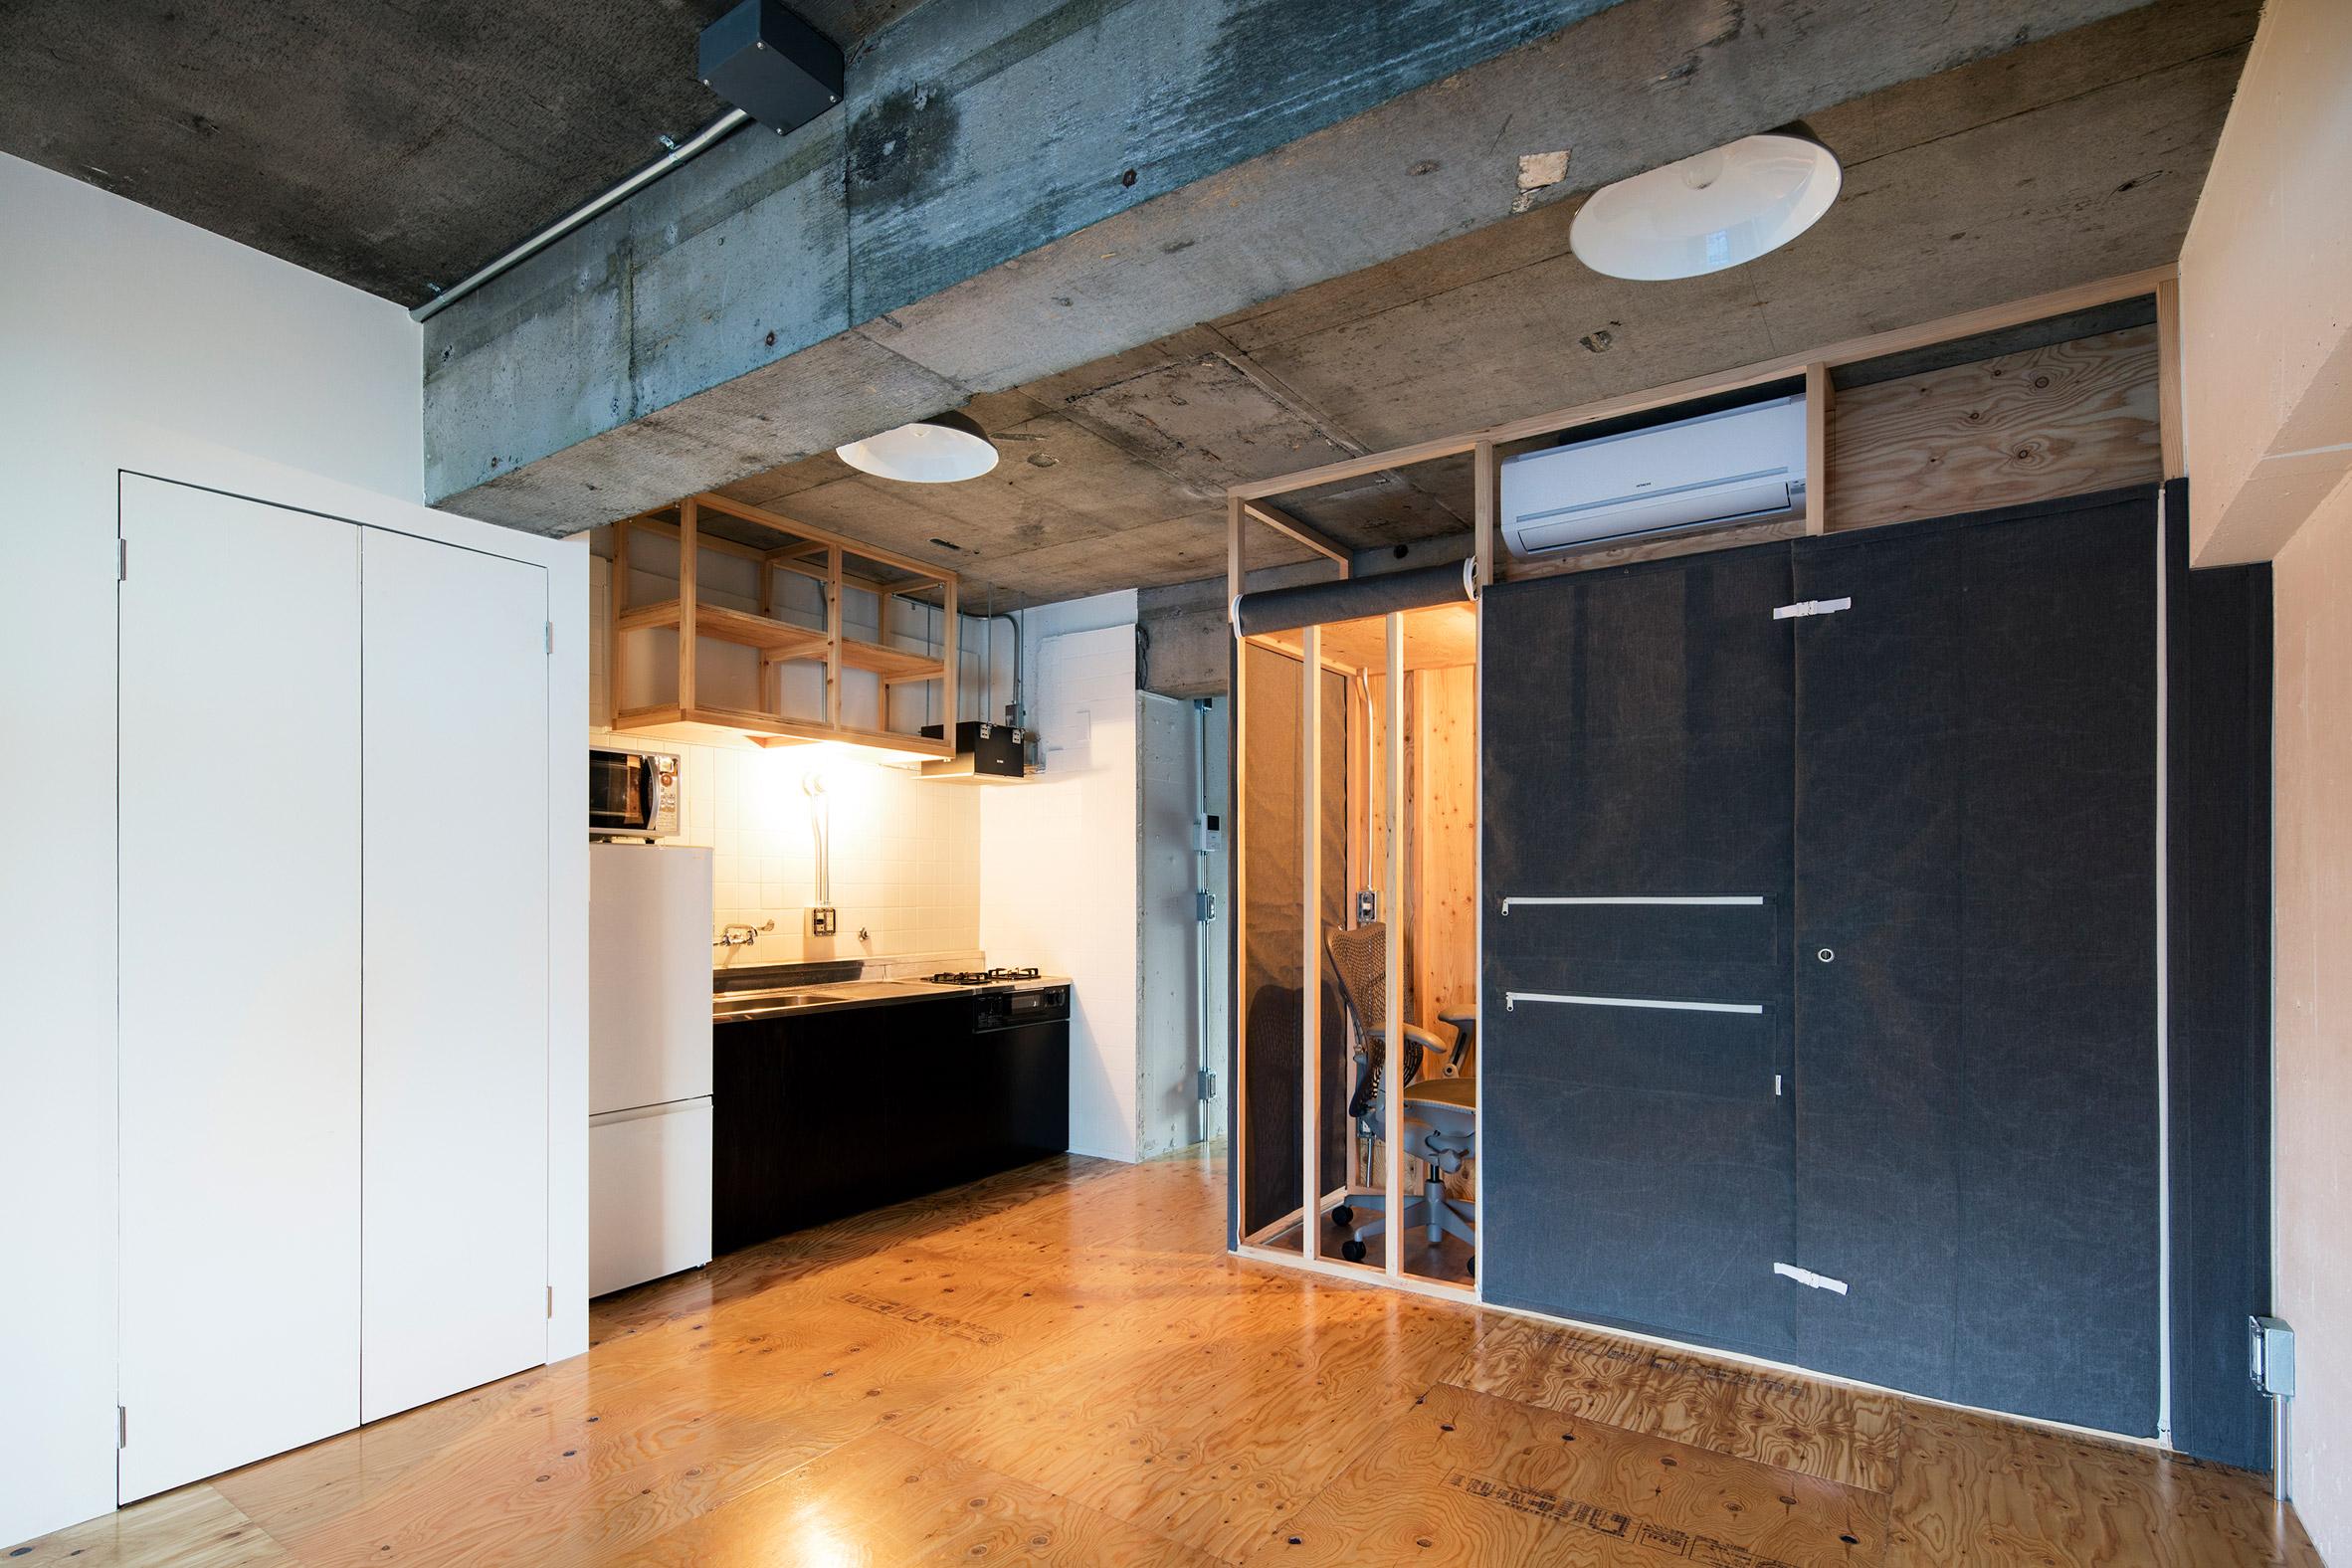 House in Nakameguro by Daisuke Motogi Architecture